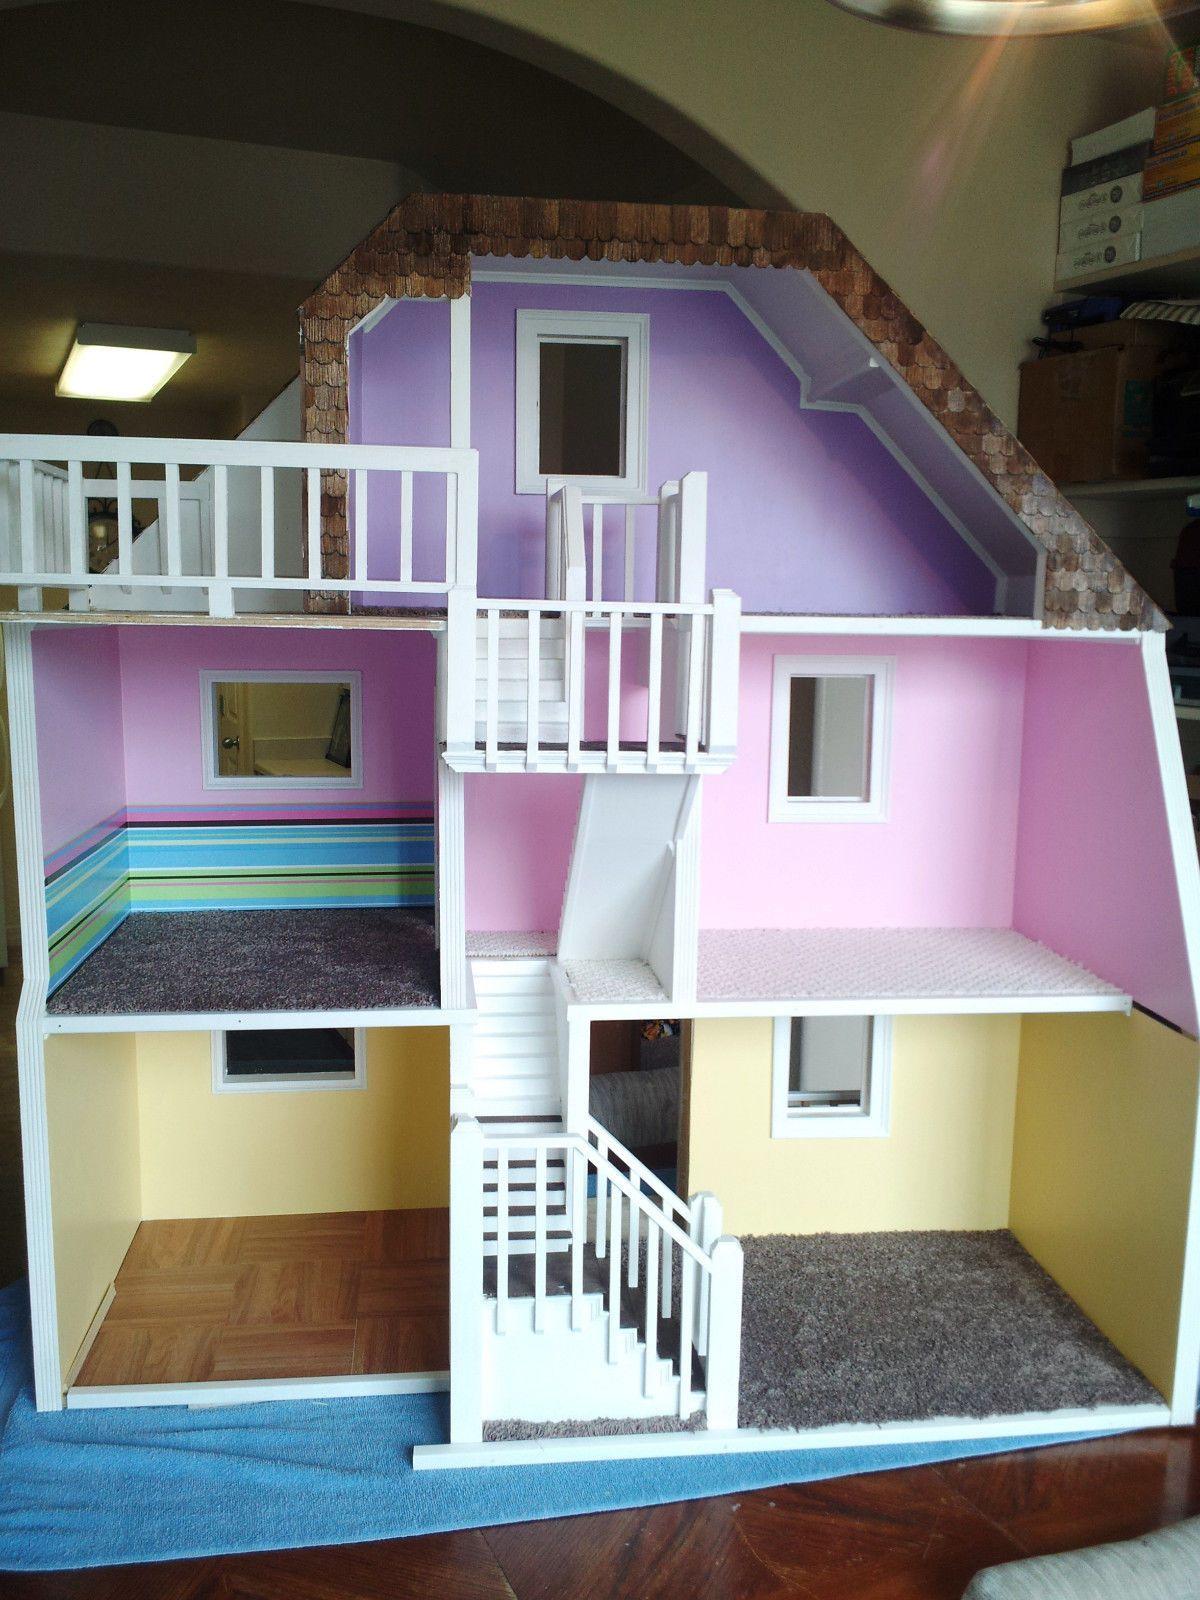 3 Story Custom Made Wood Barbie Doll House Wooden Dream Dollhouse New Sturdy Ebay Diy Barbie House Doll House Plans Barbie House